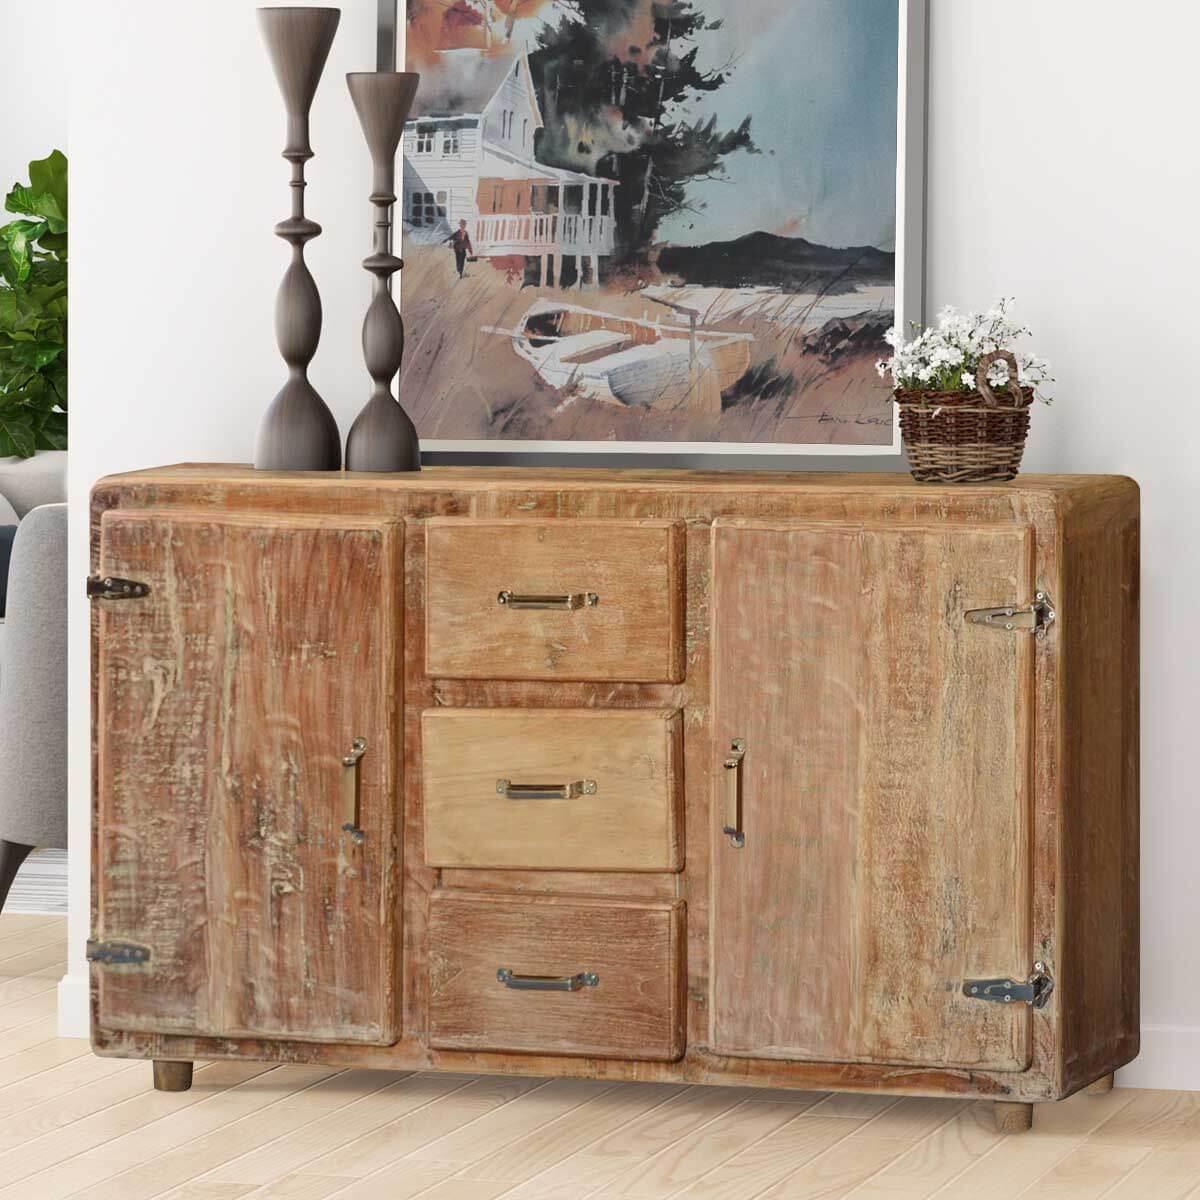 Corners Reclaimed Wood Rustic Storage Buffet Cabinet